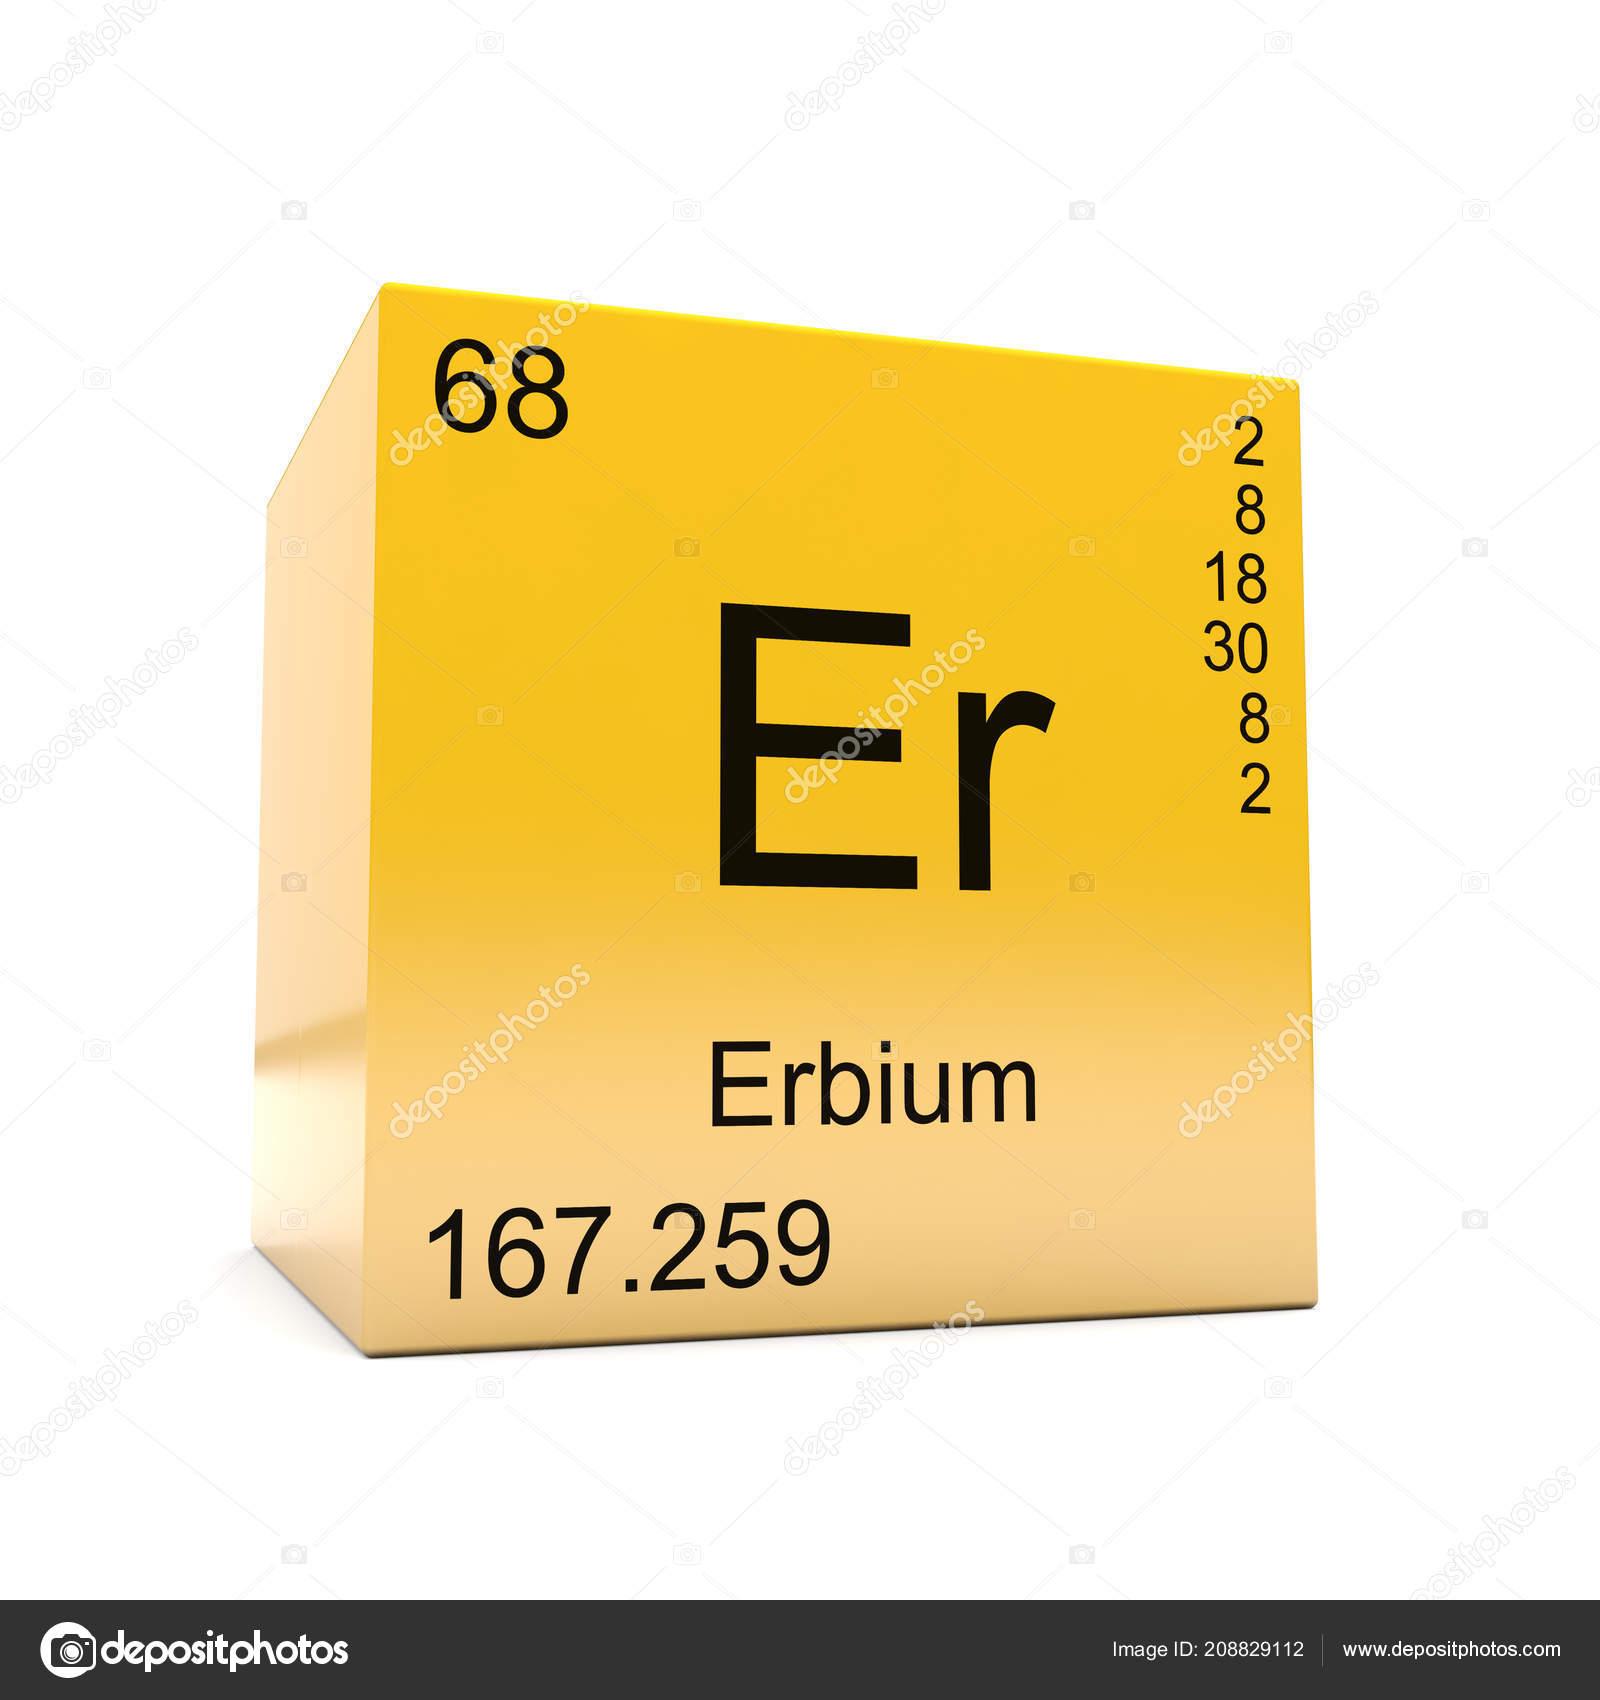 Erbium Chemical Element Symbol Periodic Table Displayed Glossy